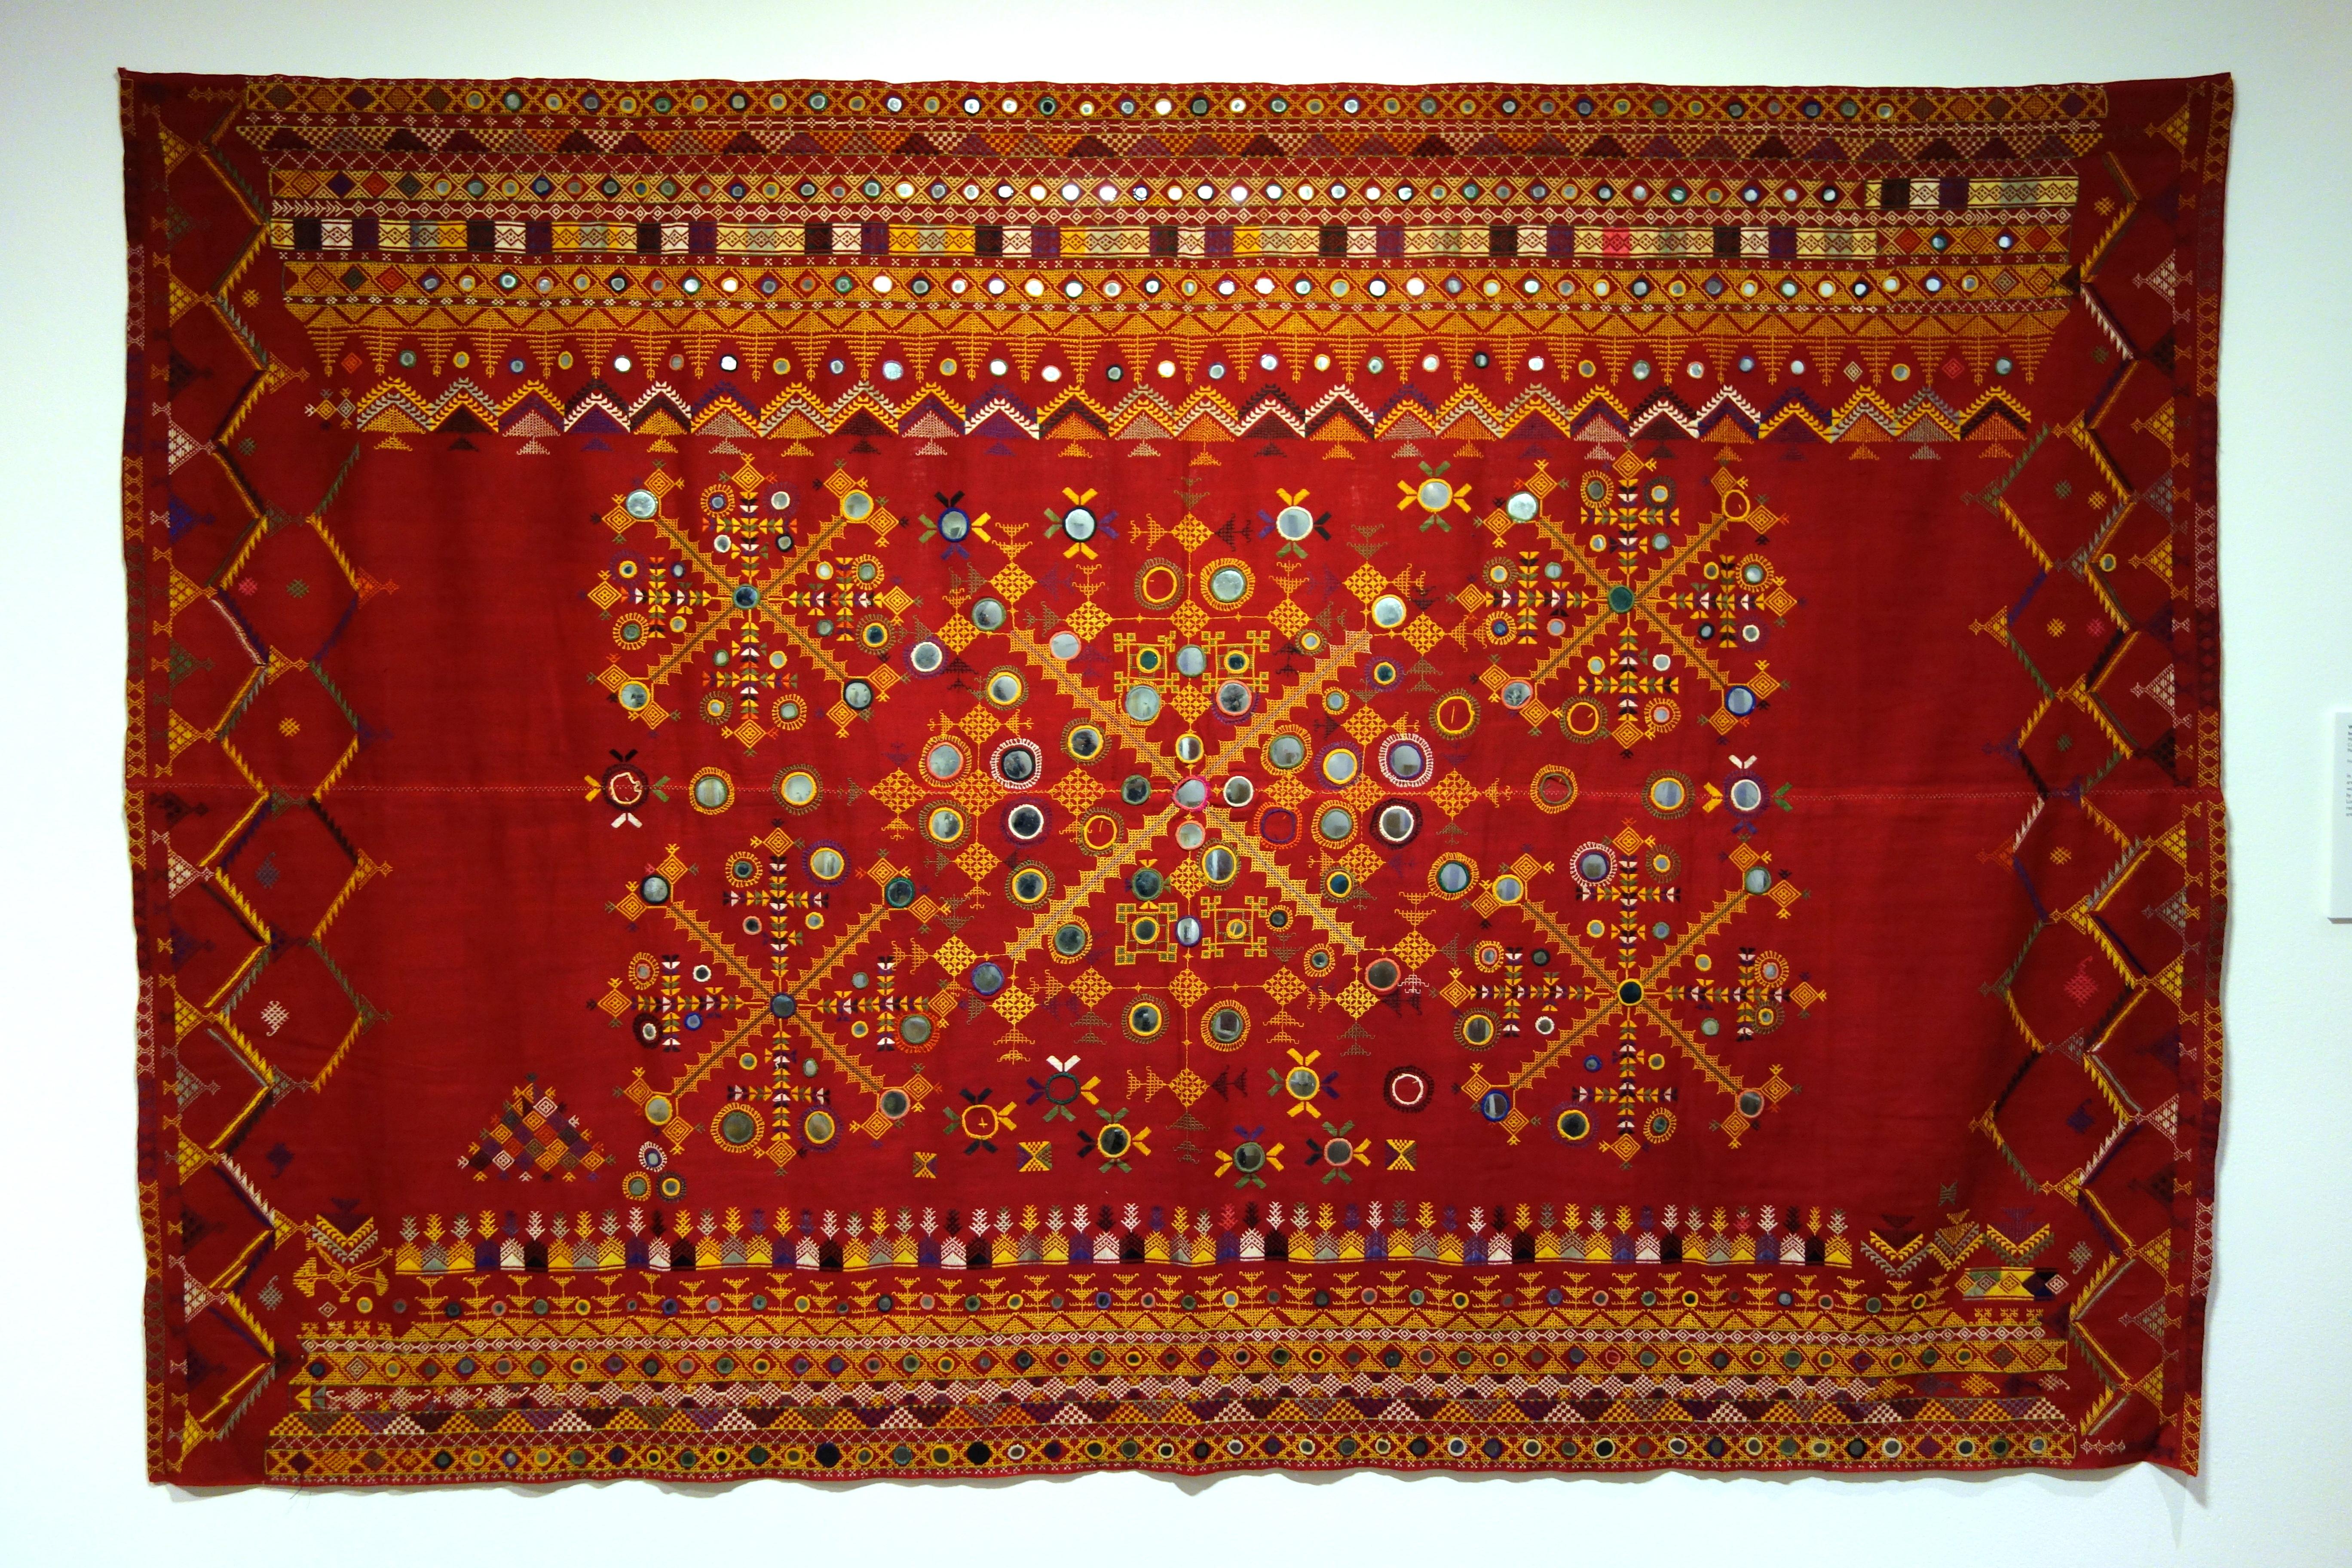 Barmer India  city images : Description Wedding shawl odhani , Barmer, Rajasthan, India, view 1 ...